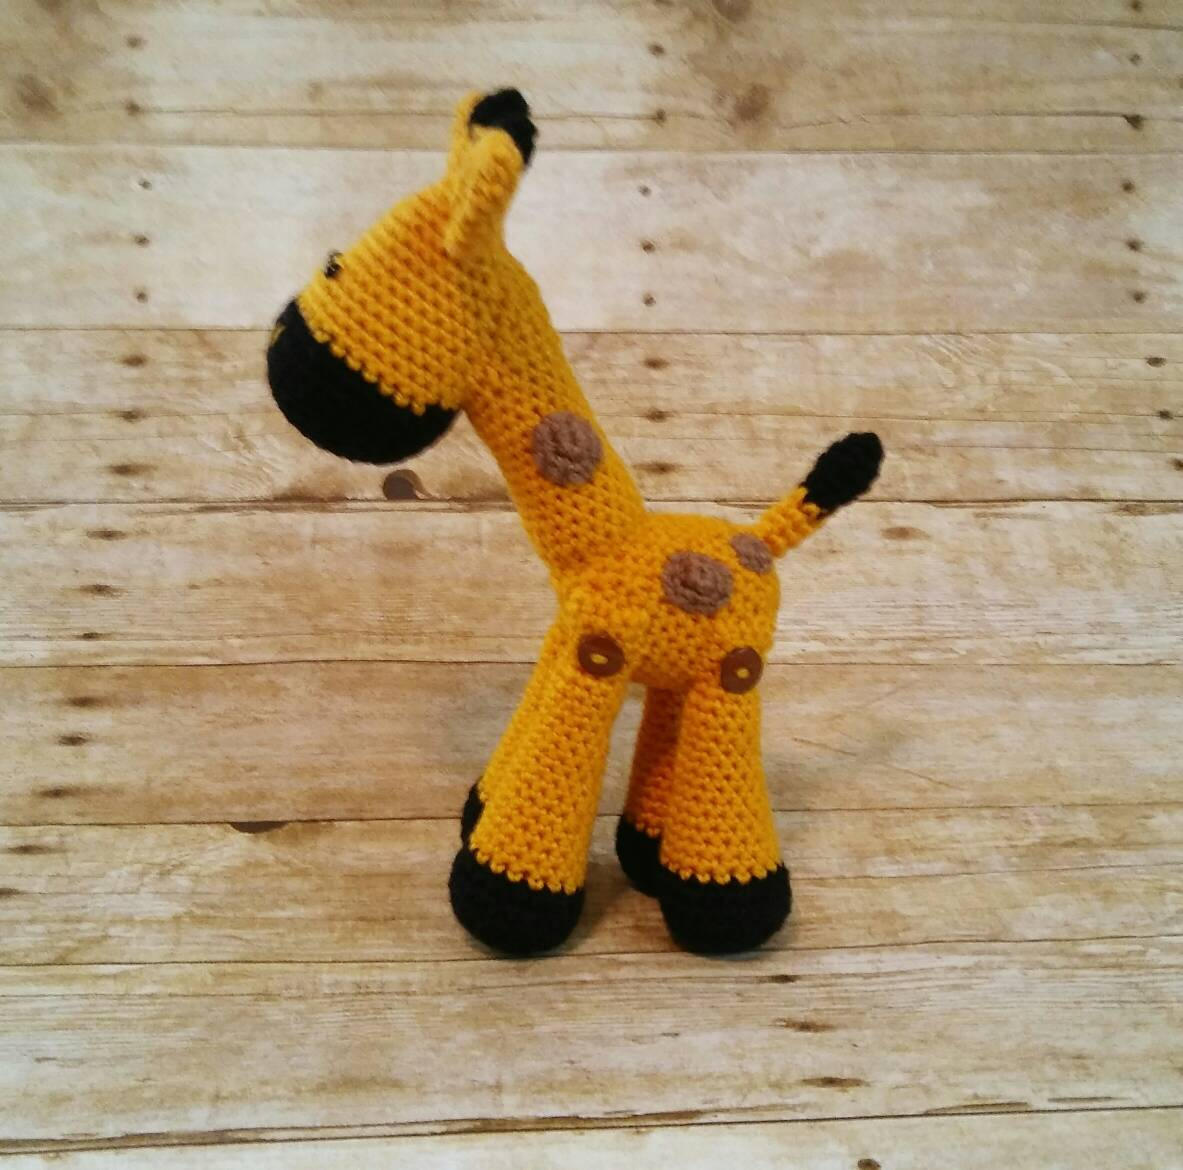 Baby giraffe amigurumi pattern - Amigurumipatterns.net | 1170x1183